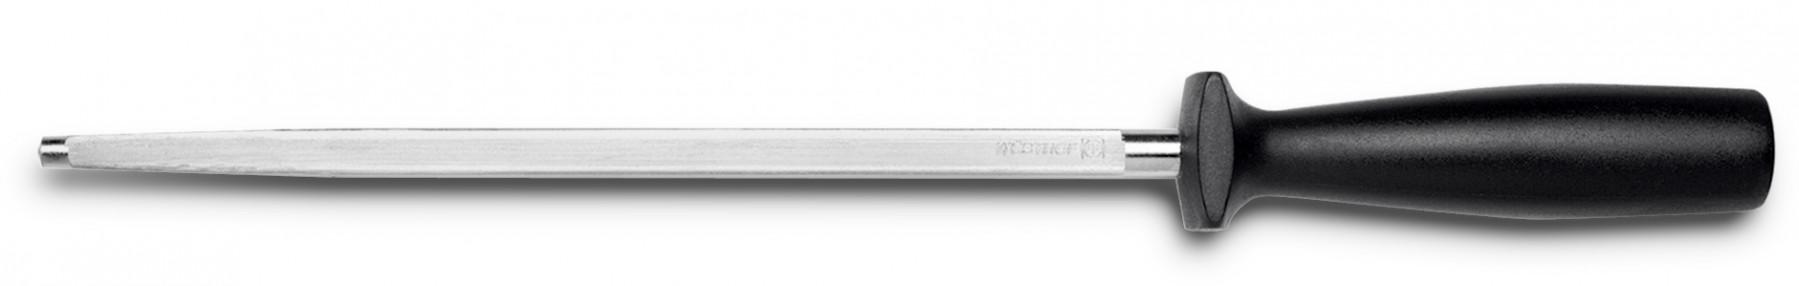 Wüsthof Dreizack Classic Messerblock 8tlg. schwarz Wetzstahl